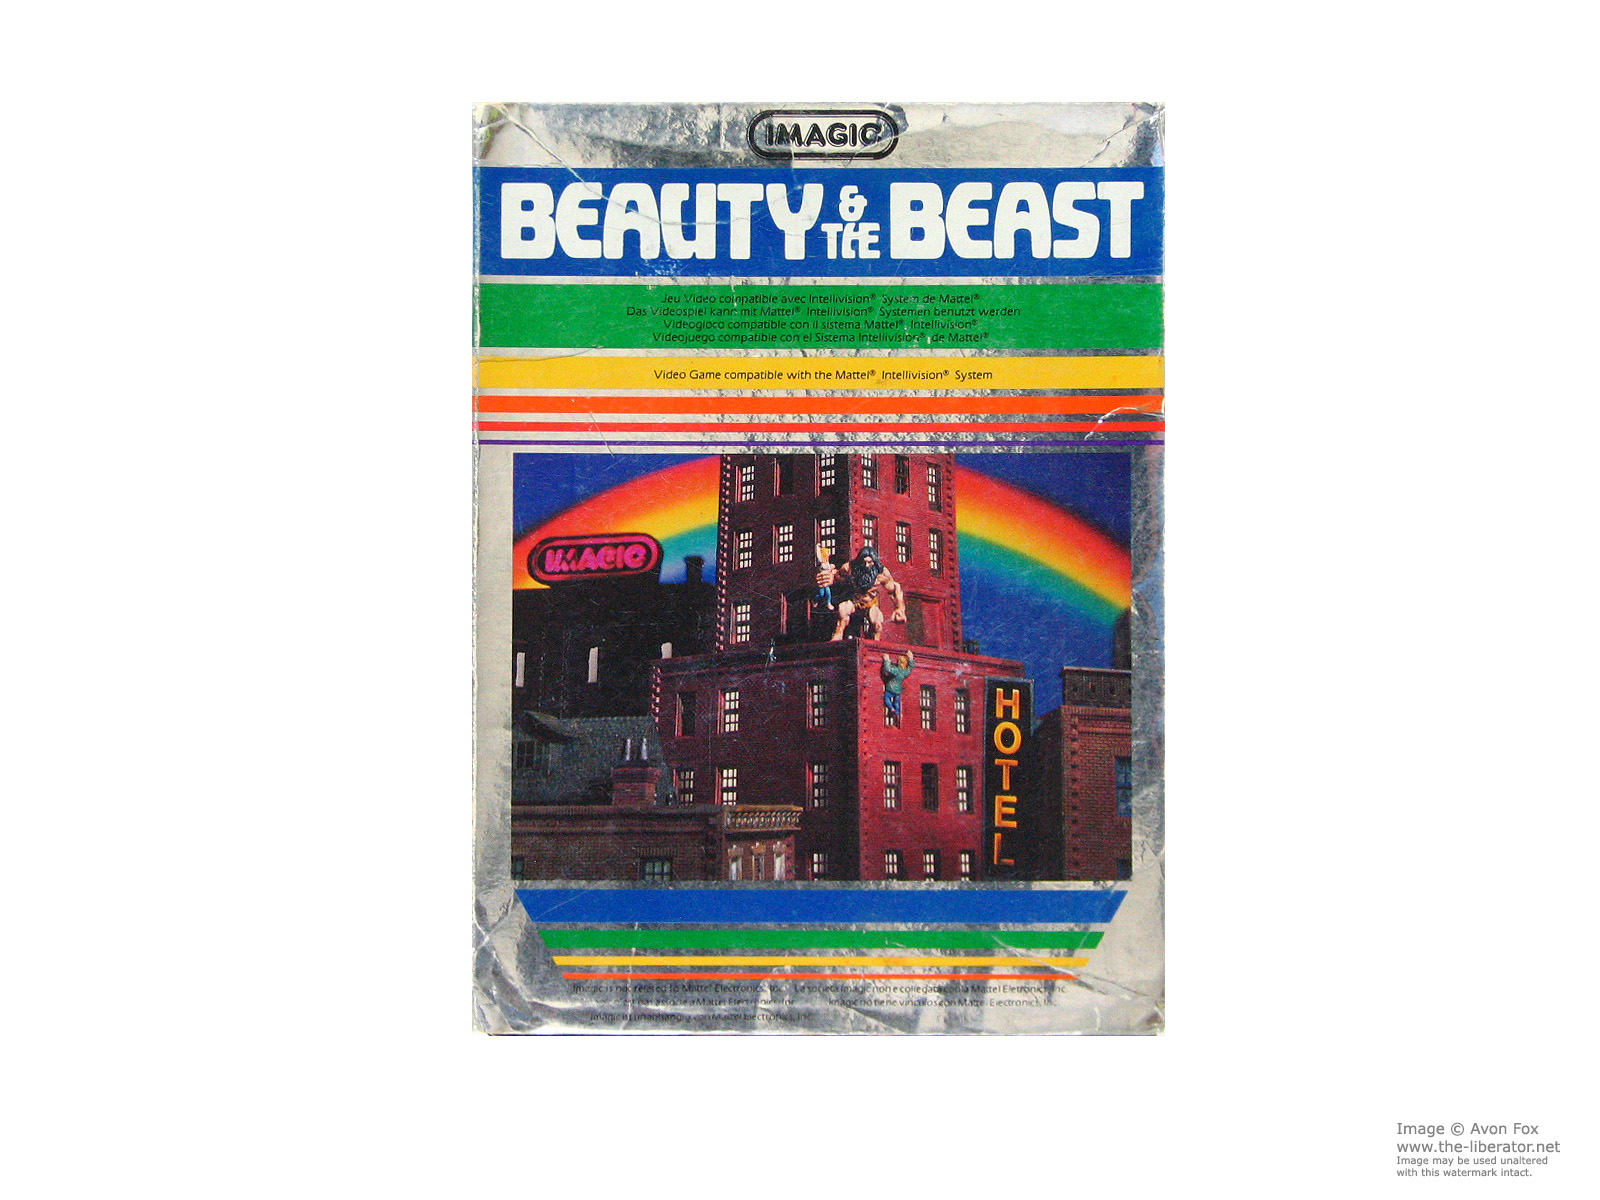 Mattel Intellivision Game Cartridges, Inserts, Box Art and ...